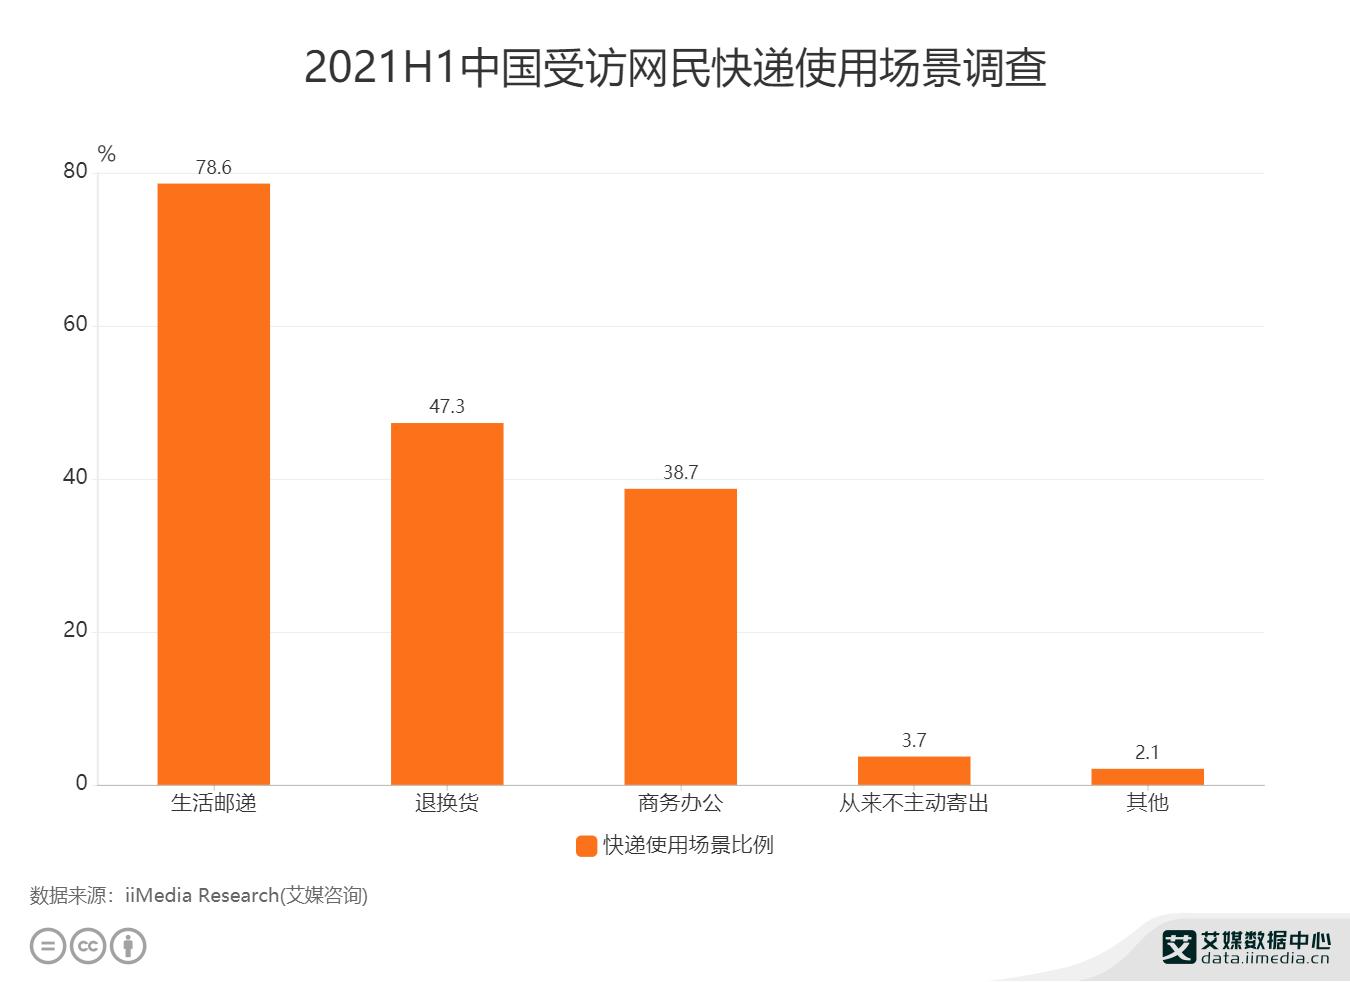 2021H1中国受访网民快递使用场景调查.png